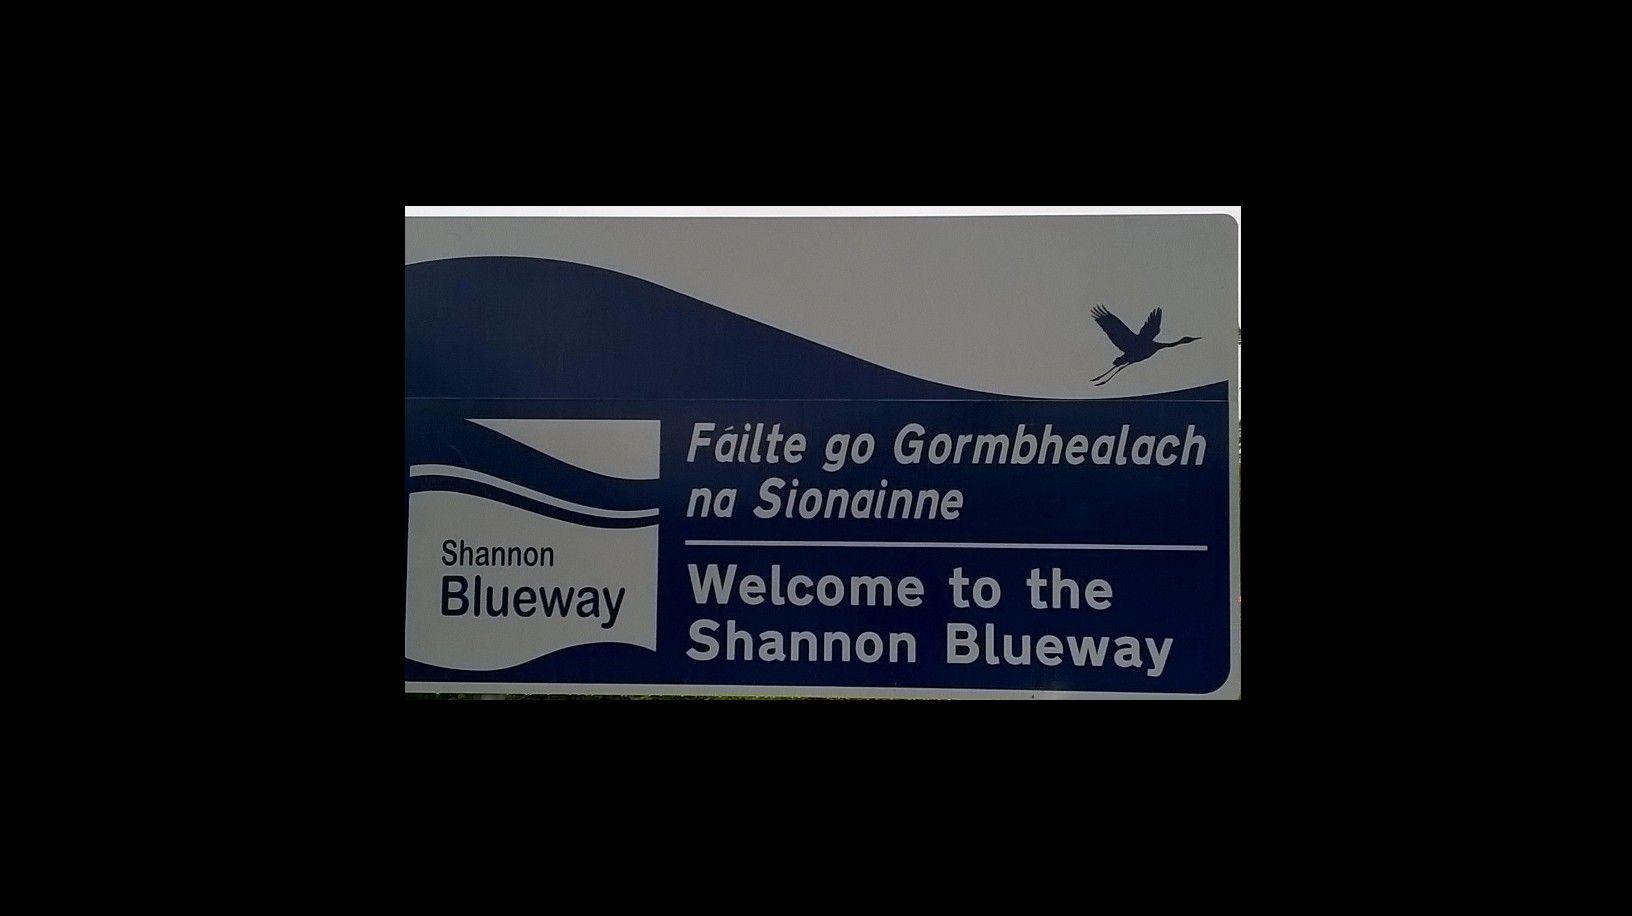 Carrick Hosts launch of Regional Blueway